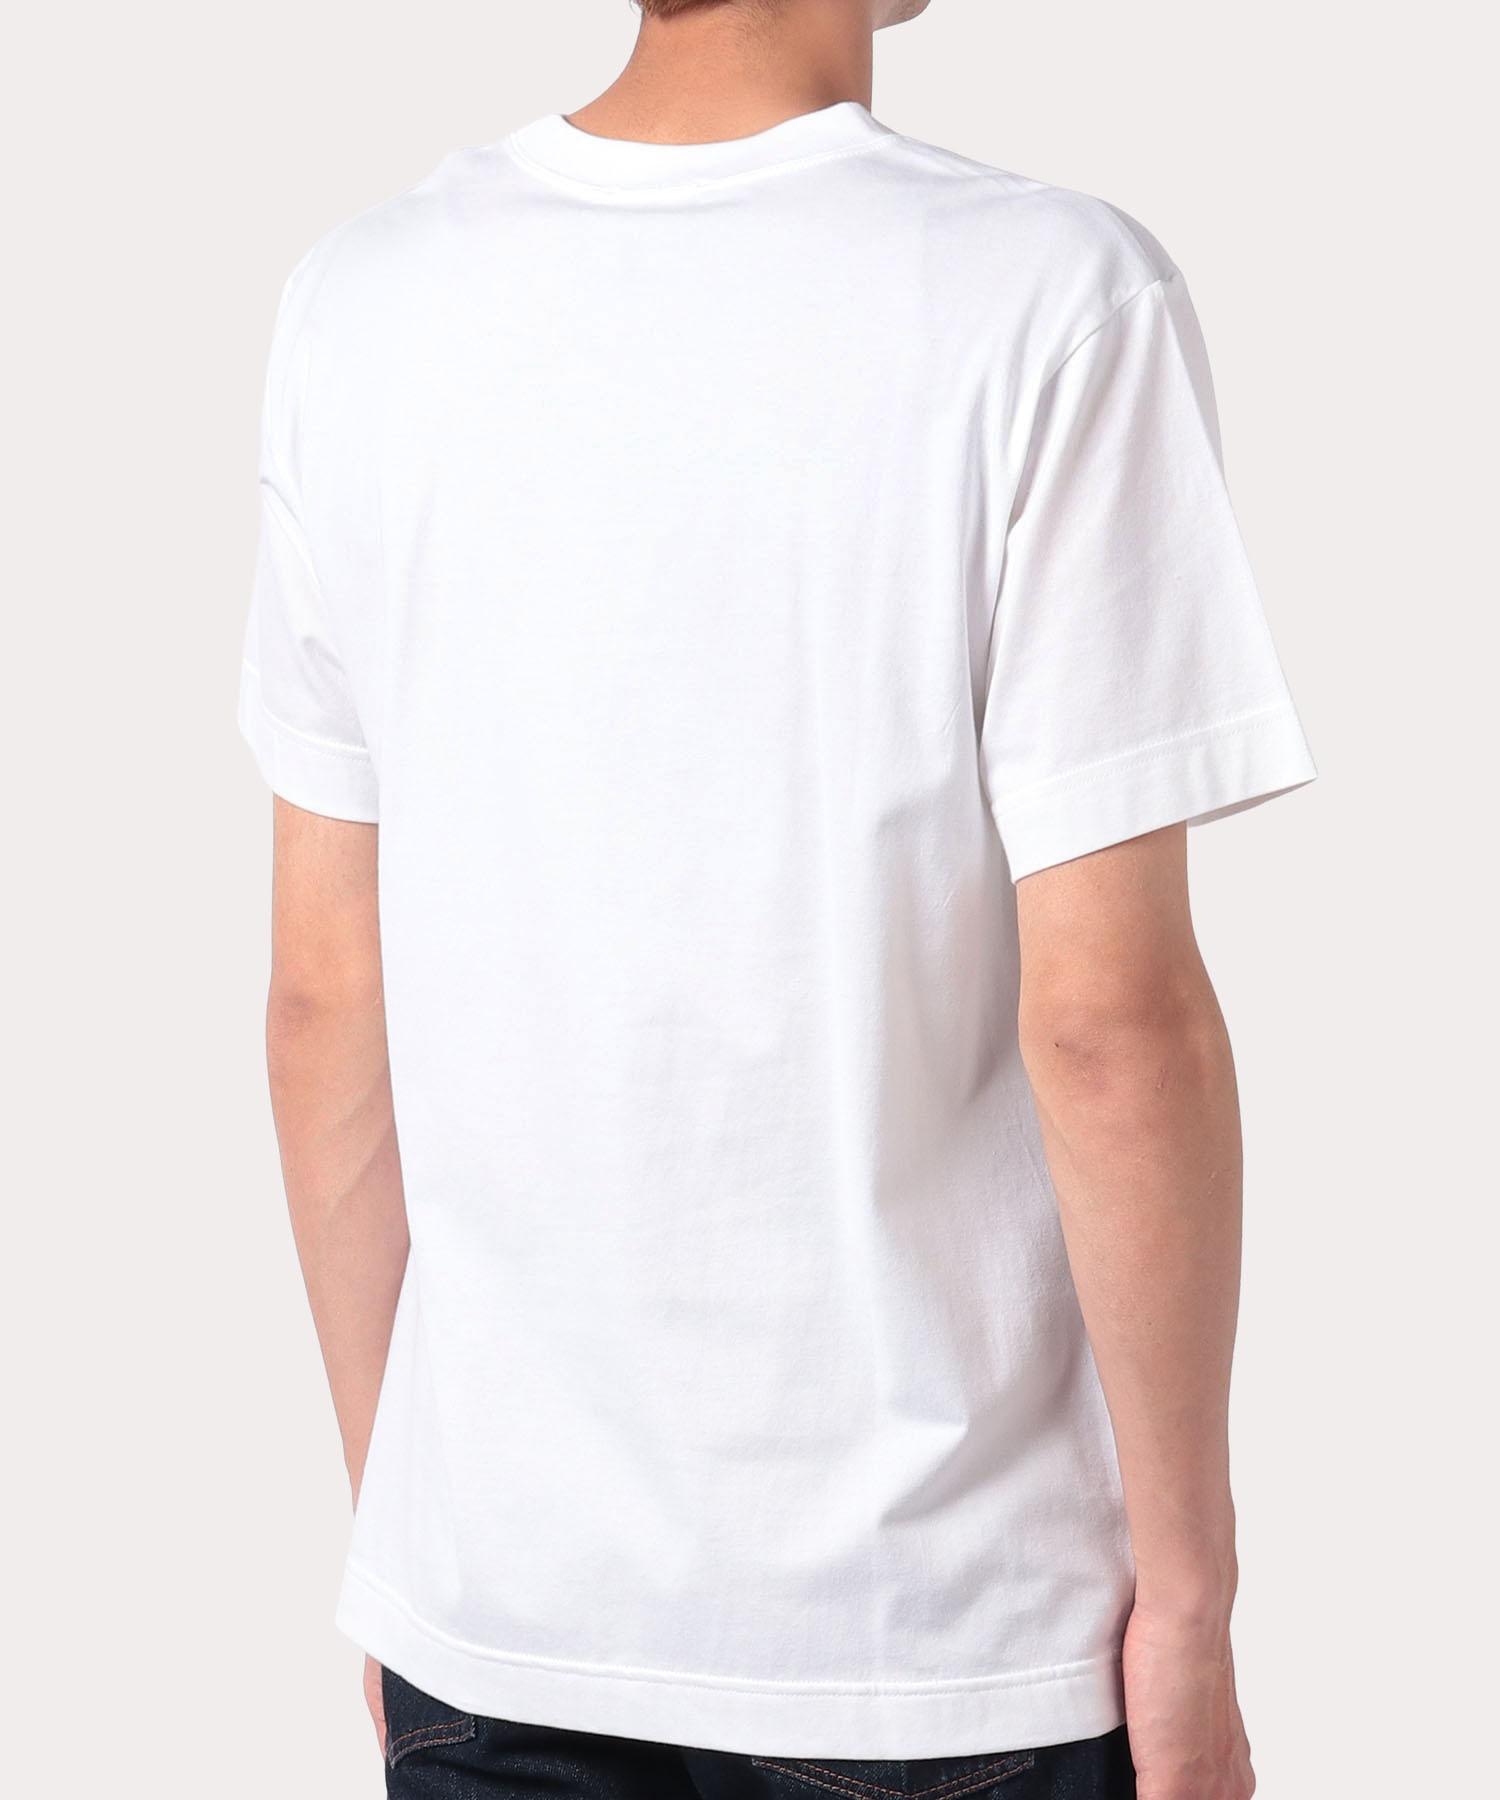 LIGHTING ORB リラックス半袖Tシャツ